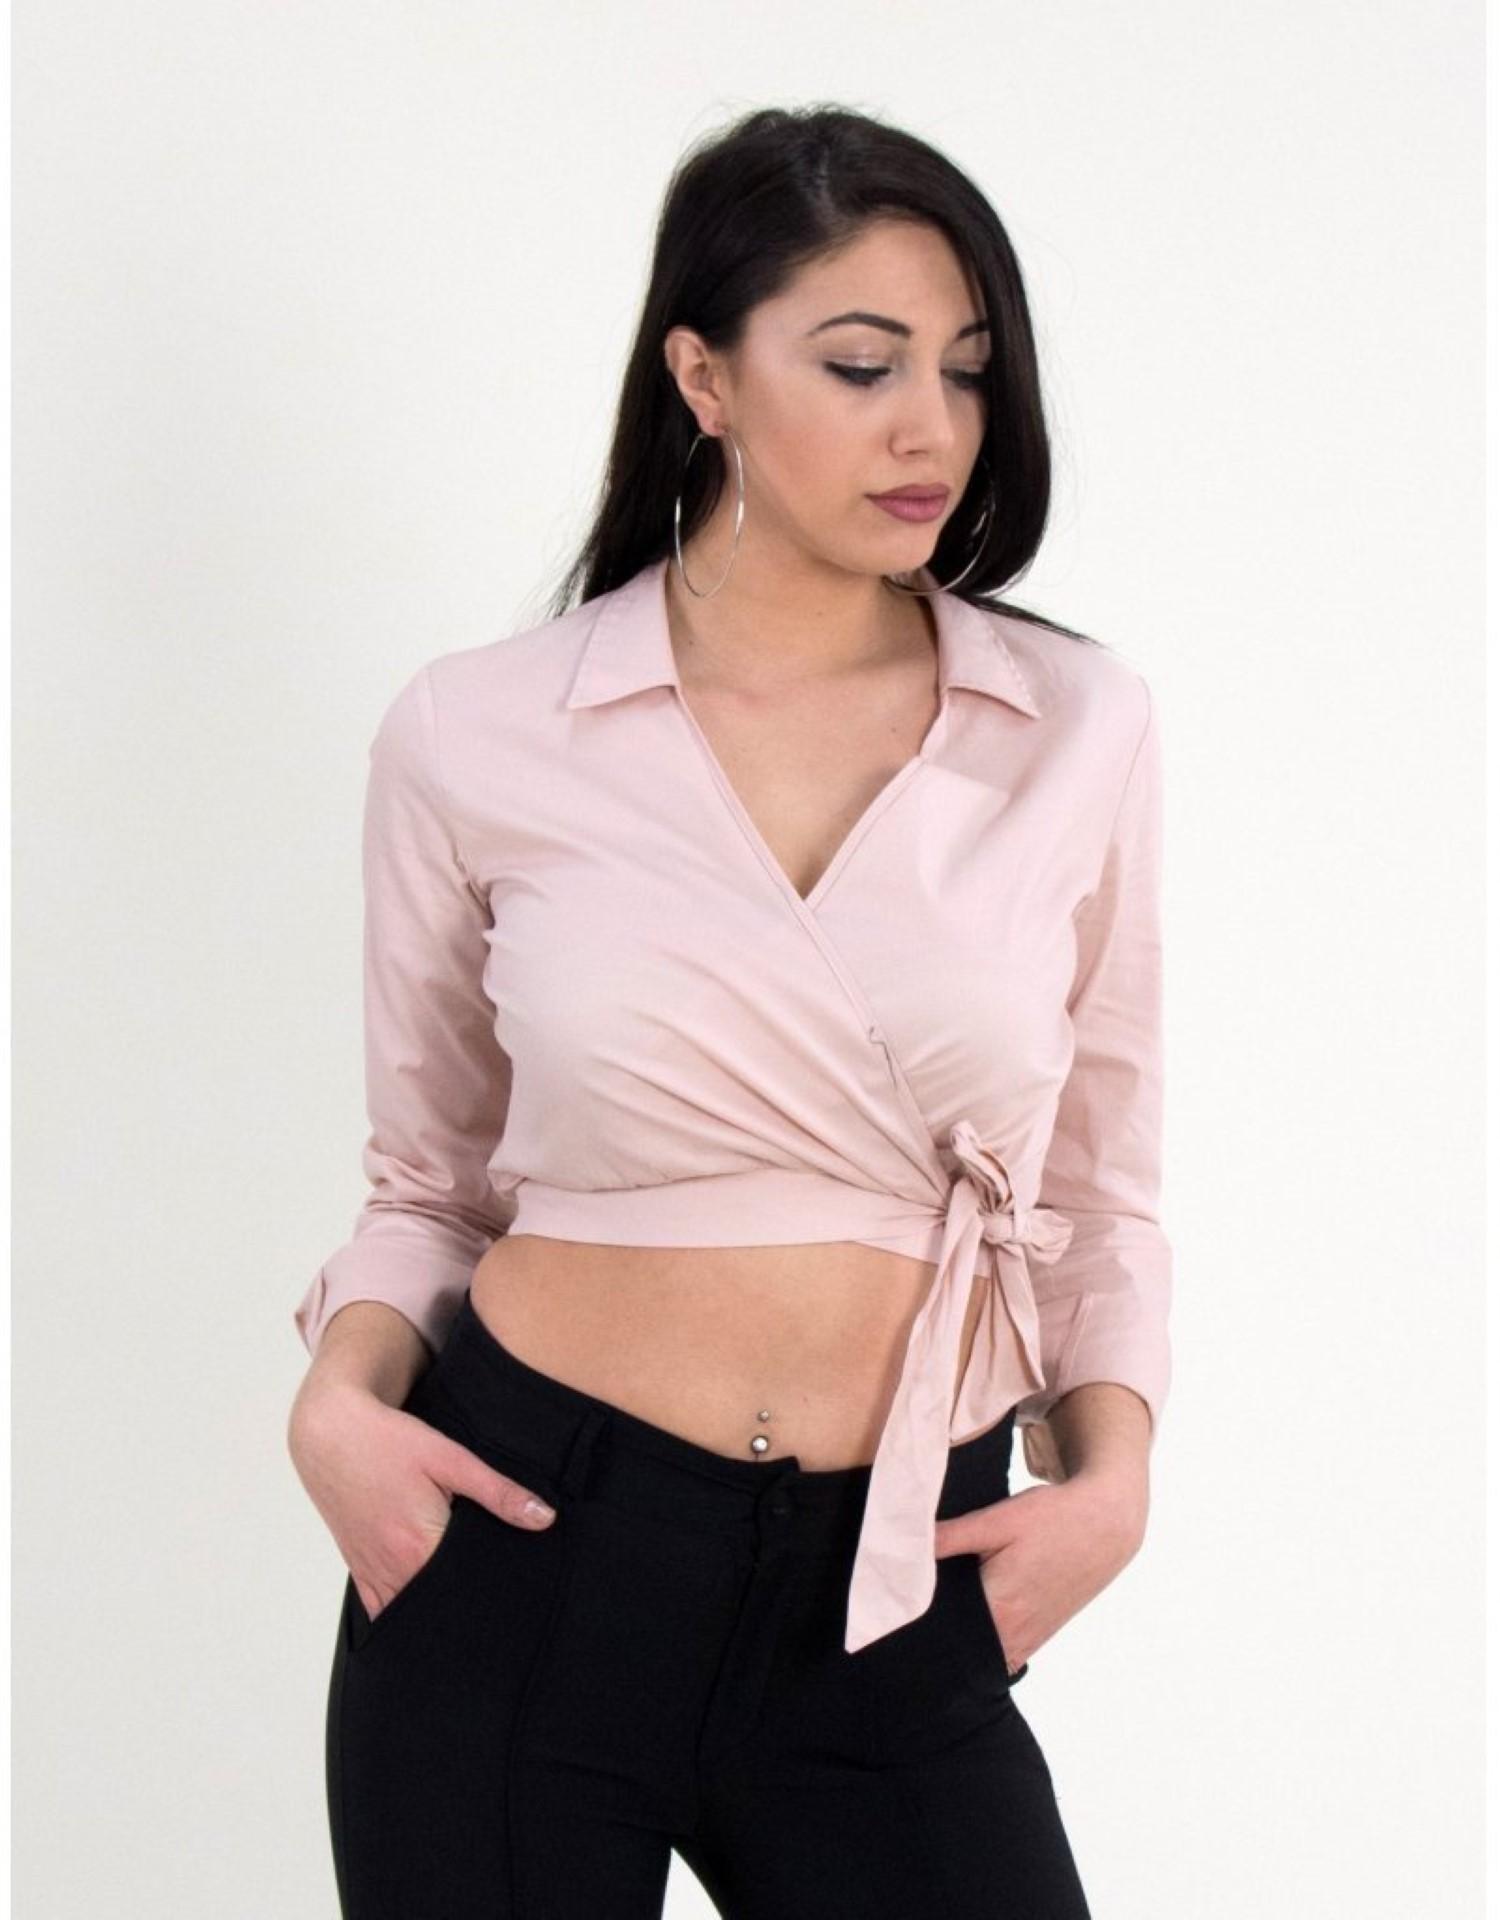 4577cbb960a1 Γυναικείο κρουαζέ τοπ πουκάμισο Cocktail ροζ 014006010C